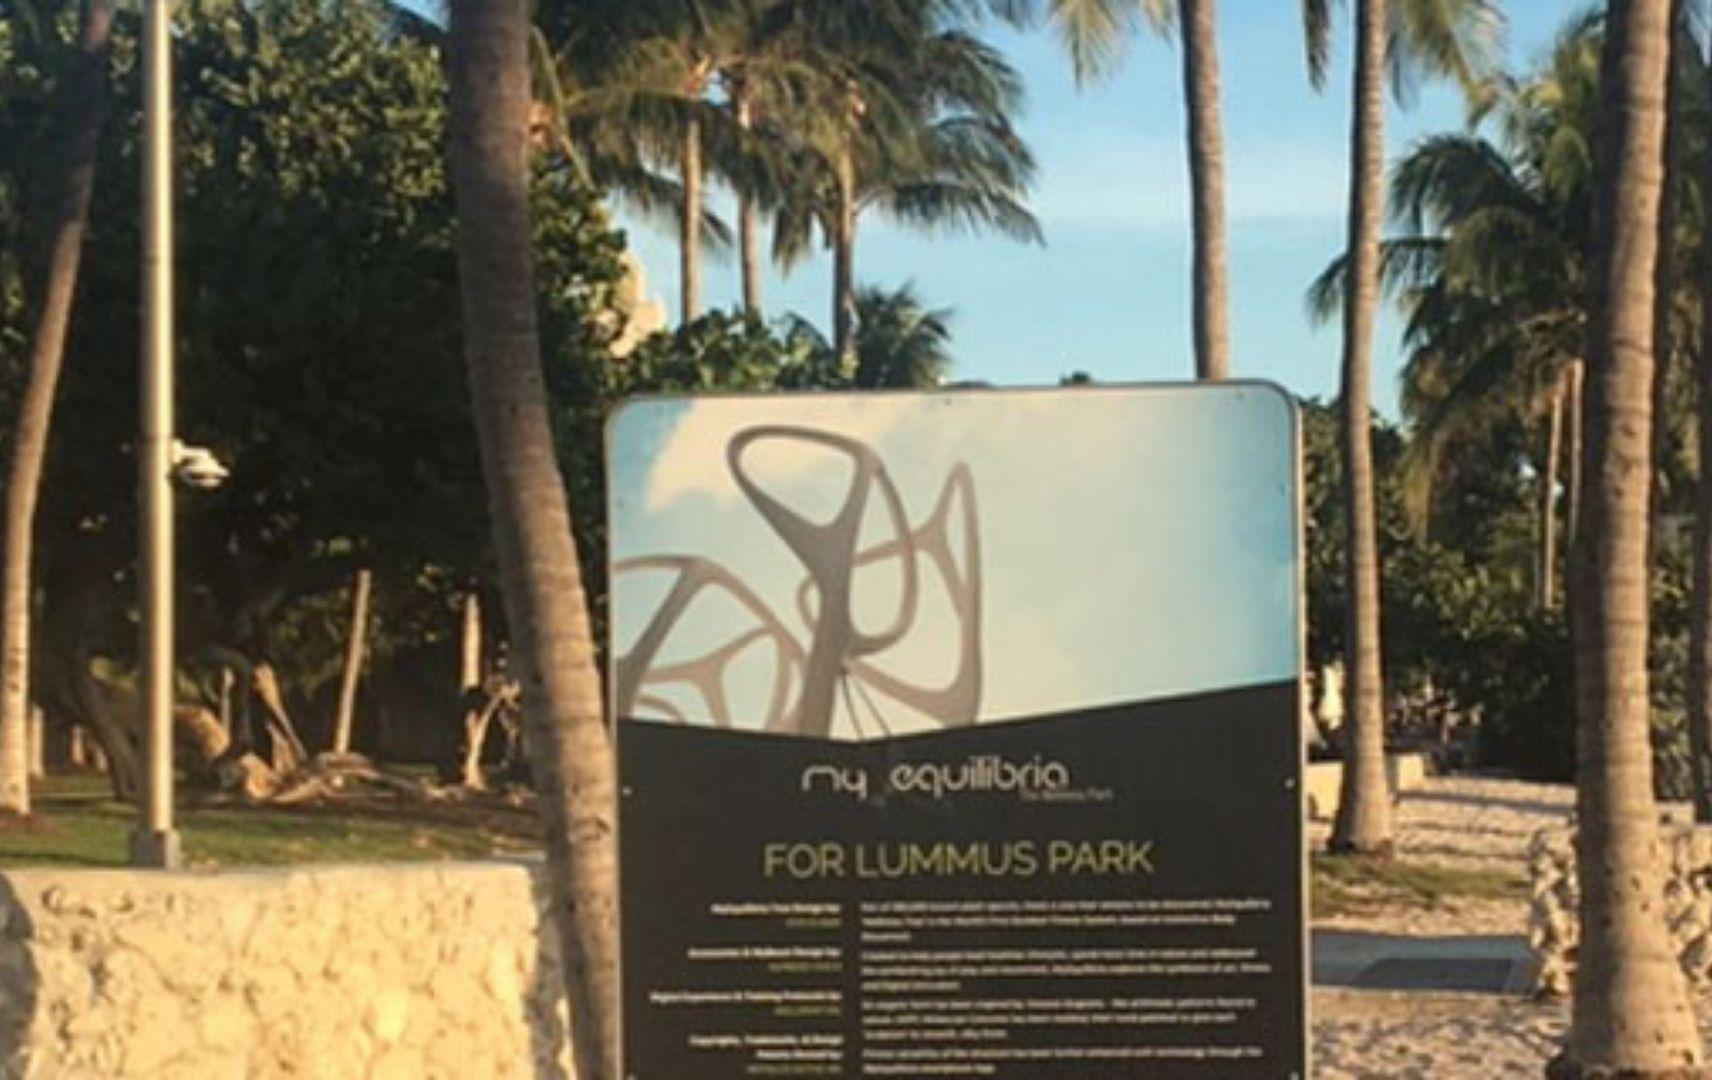 Miami Lummus Park